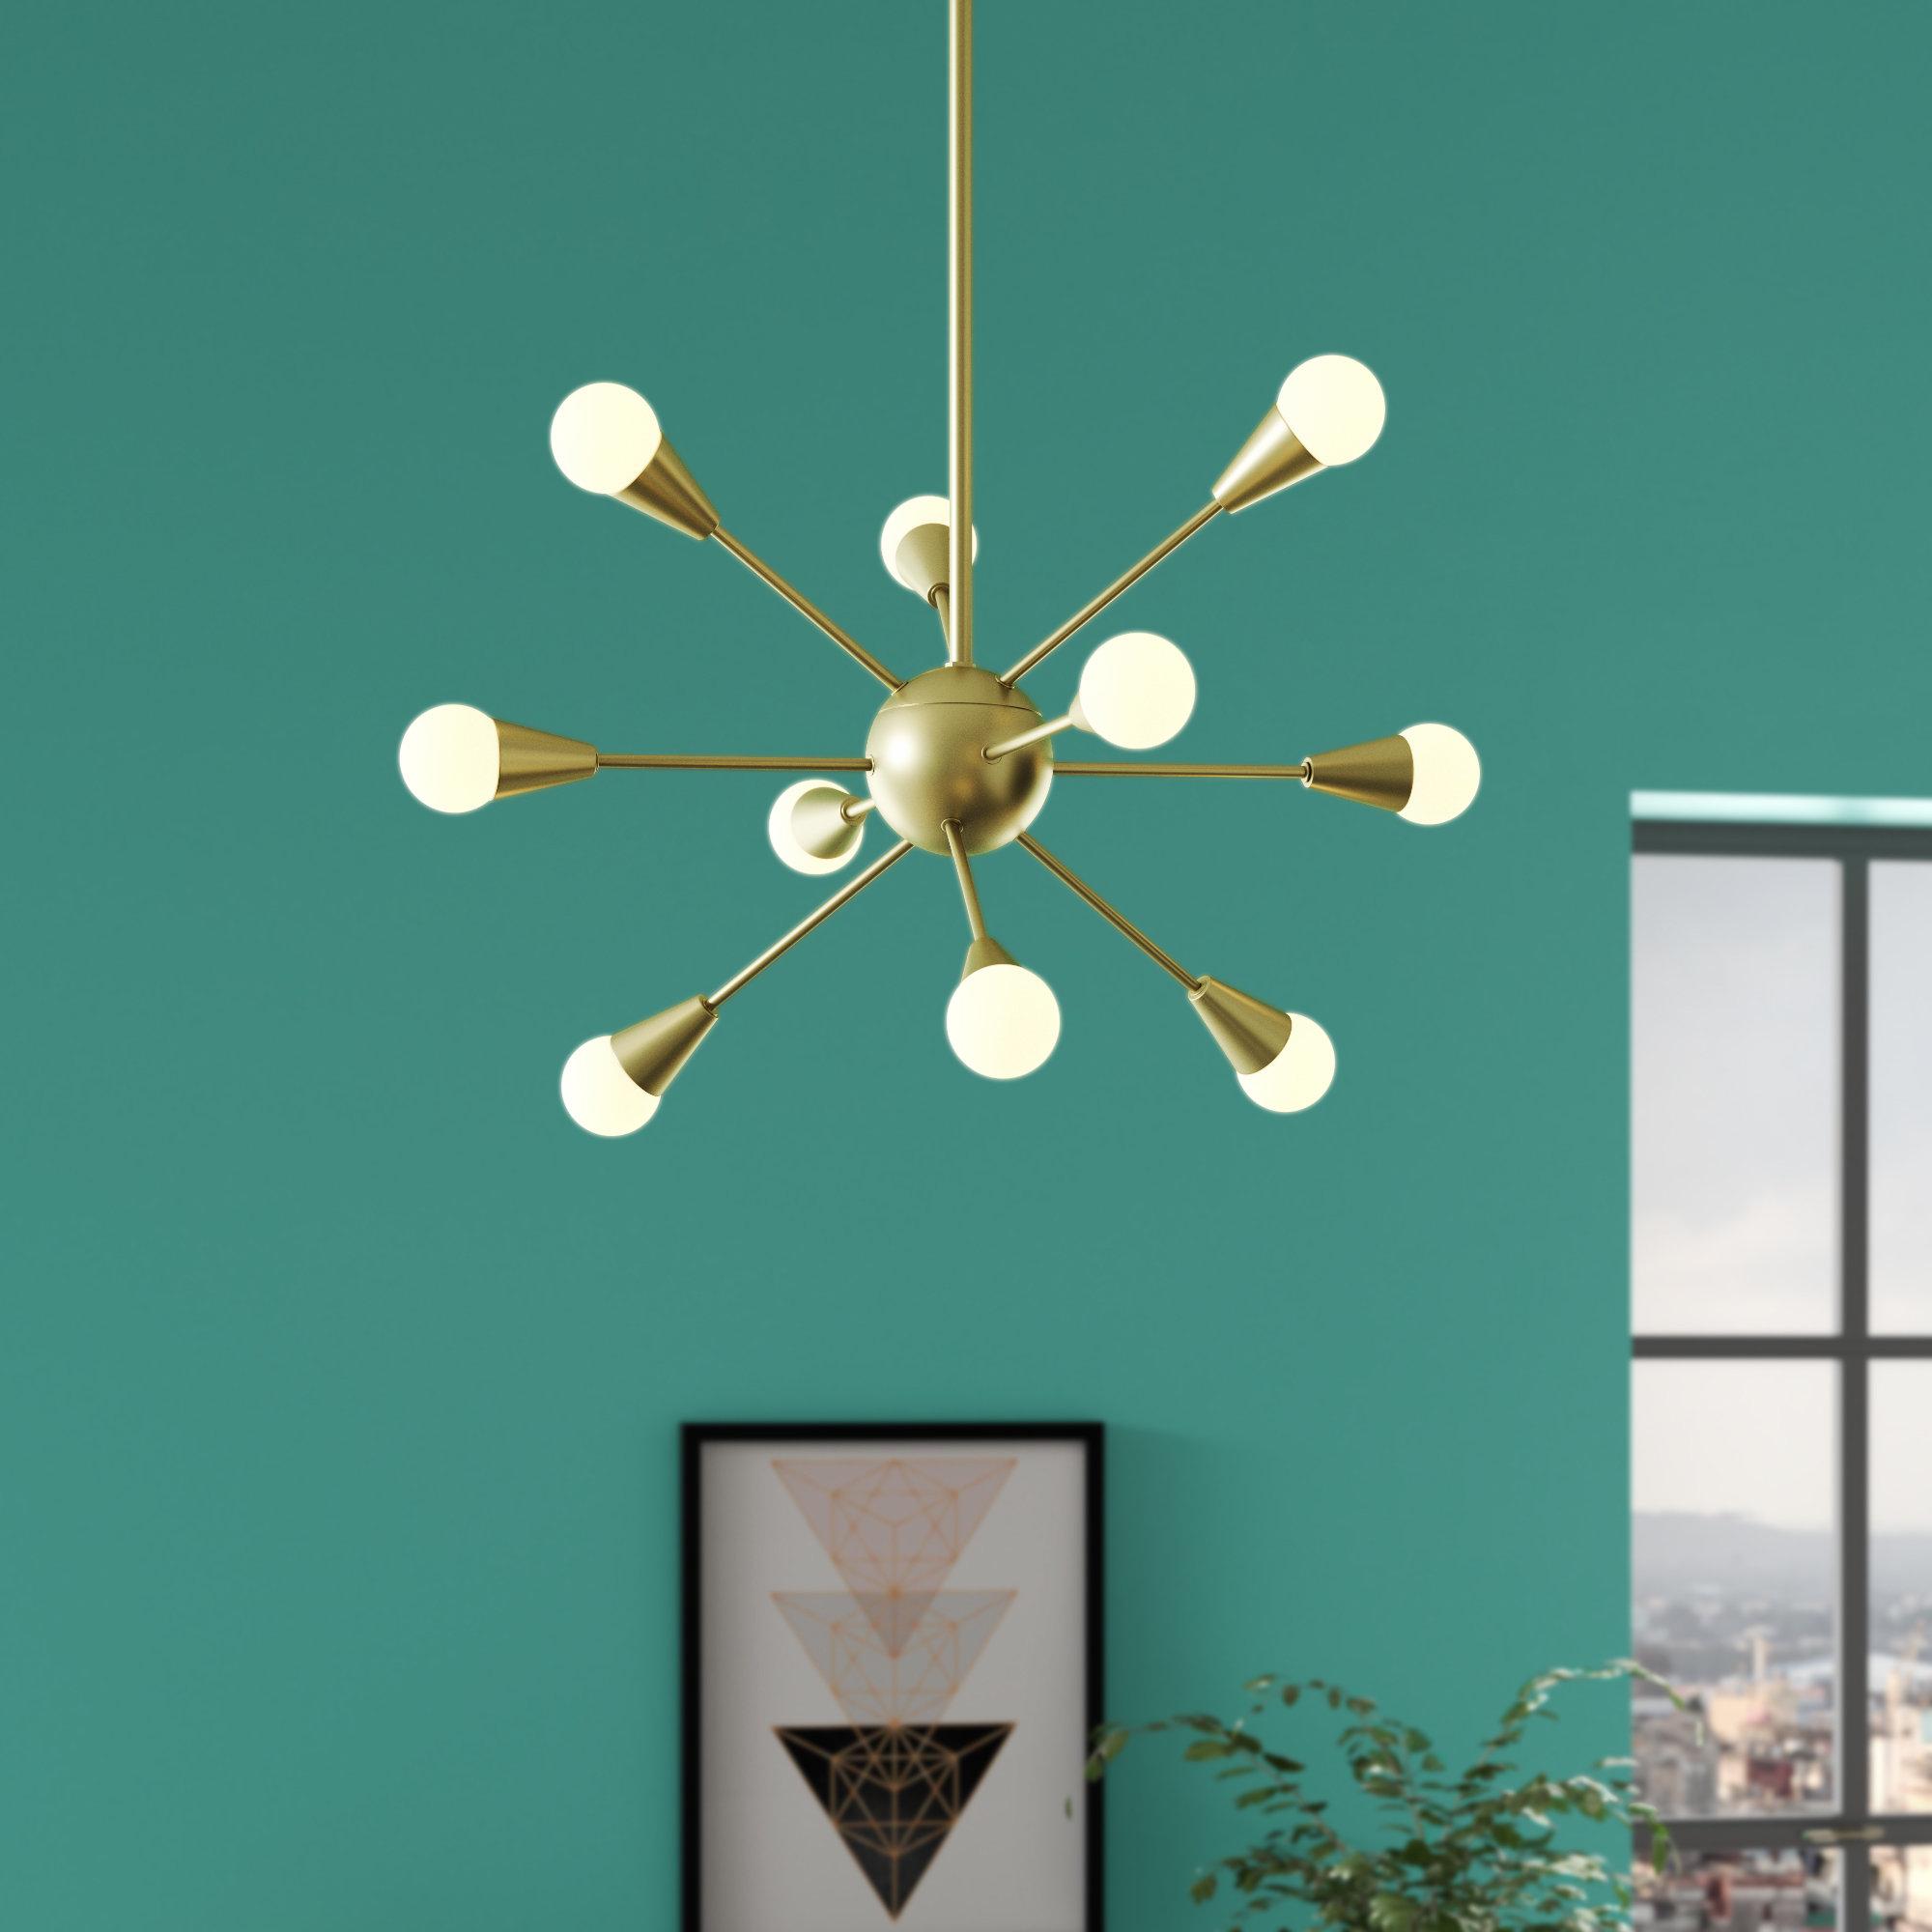 Best And Newest Everett 10 Light Sputnik Chandeliers With Delavega 10 Light Sputnik Chandelier (View 6 of 20)